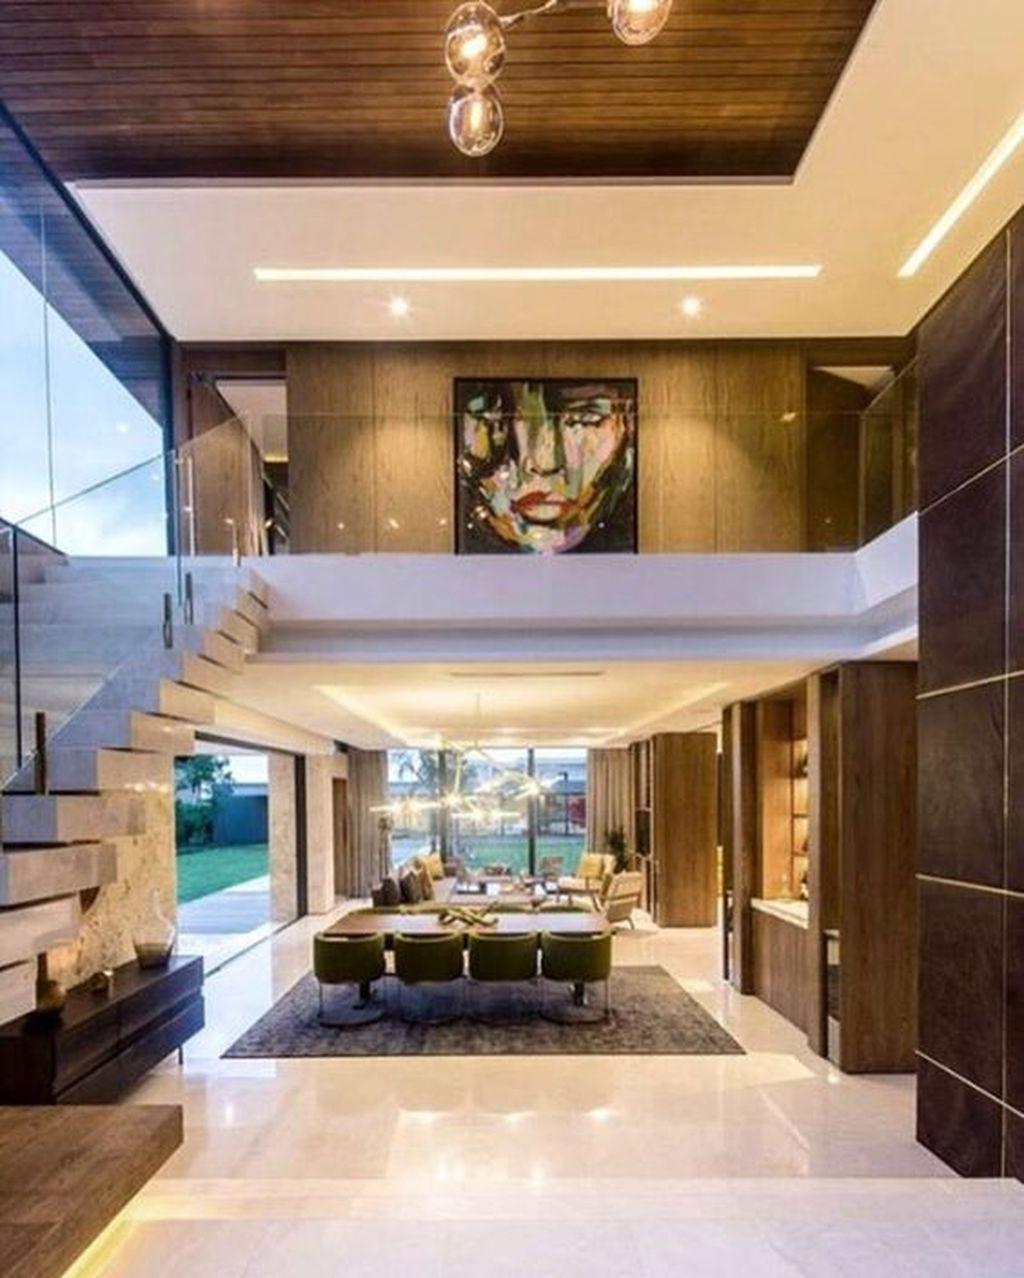 50 Stunning Modern House Design Interior Ideas Trendehouse Modern House Design Modern Houses Interior Architecture House